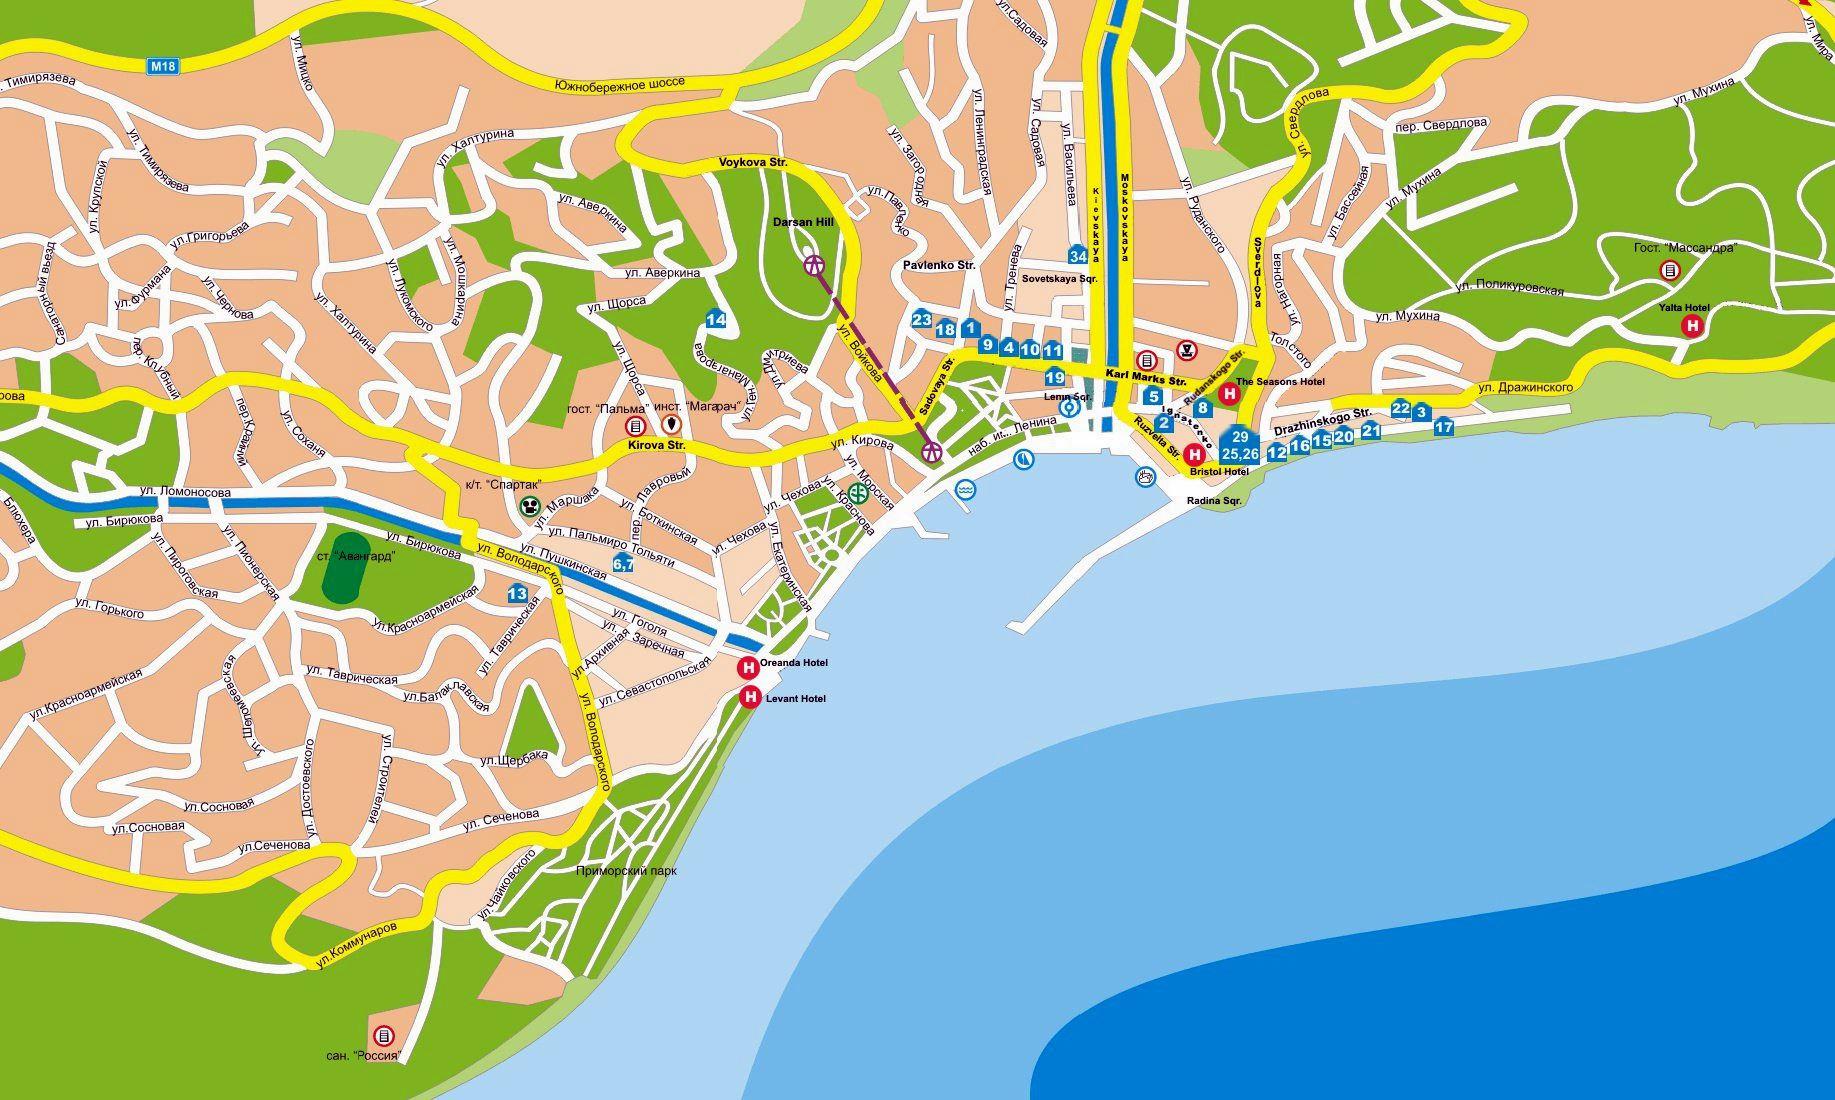 Large Yalta Maps for Free Download and Print   High-Resolution and on antwerp map, leningrad map, hiroshima map, crimea map, yalta conference, stalingrad map, yusupov palace, gdansk map, sochi map, livadia palace, mukacheve map, nuremberg map, anapa map, casablanca map, vorontsov palace, vichy map, crimean peninsula map, riga map, tehran map, black sea map, ukraine map, sea of azov, donetsk map, berlin map, caucasus mountains map,